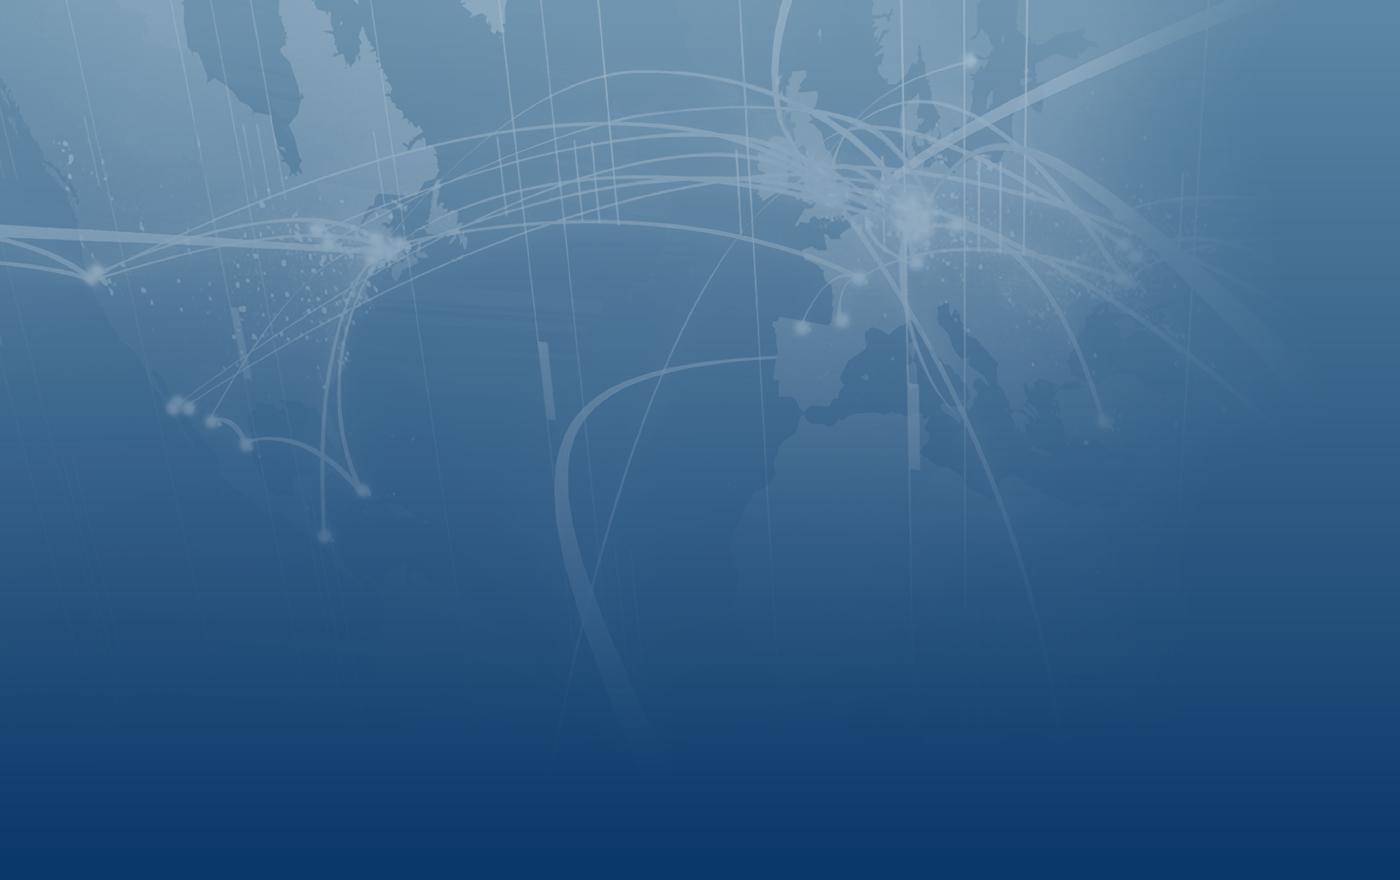 Web Wallpaper Background - WallpaperSafari